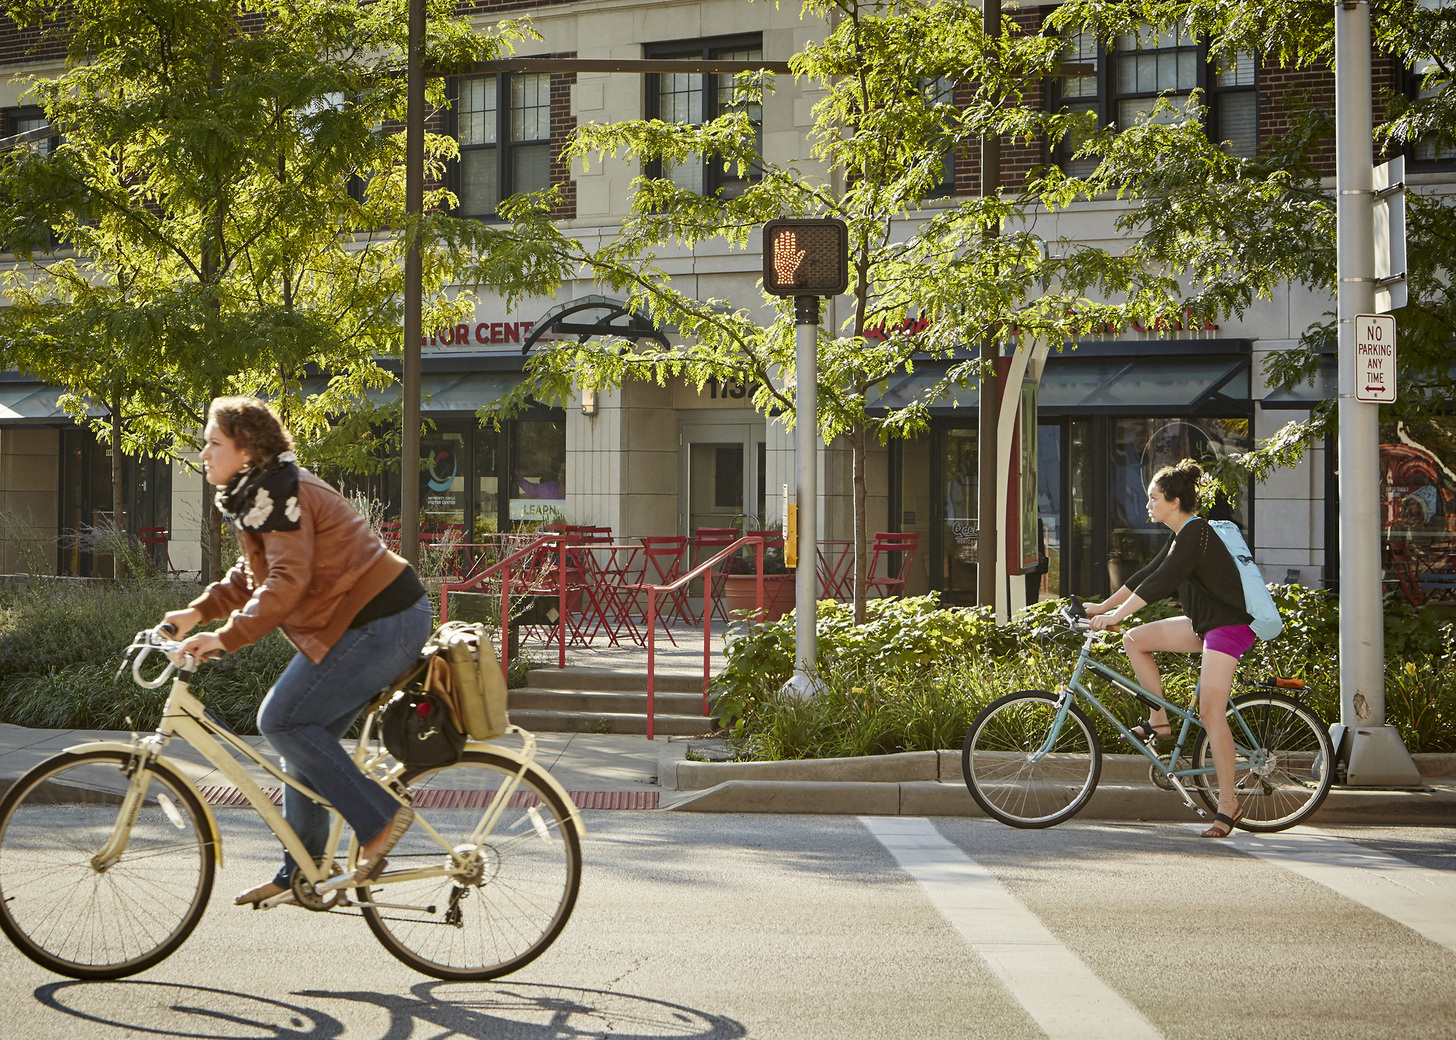 Parking & Transportation in University Circle